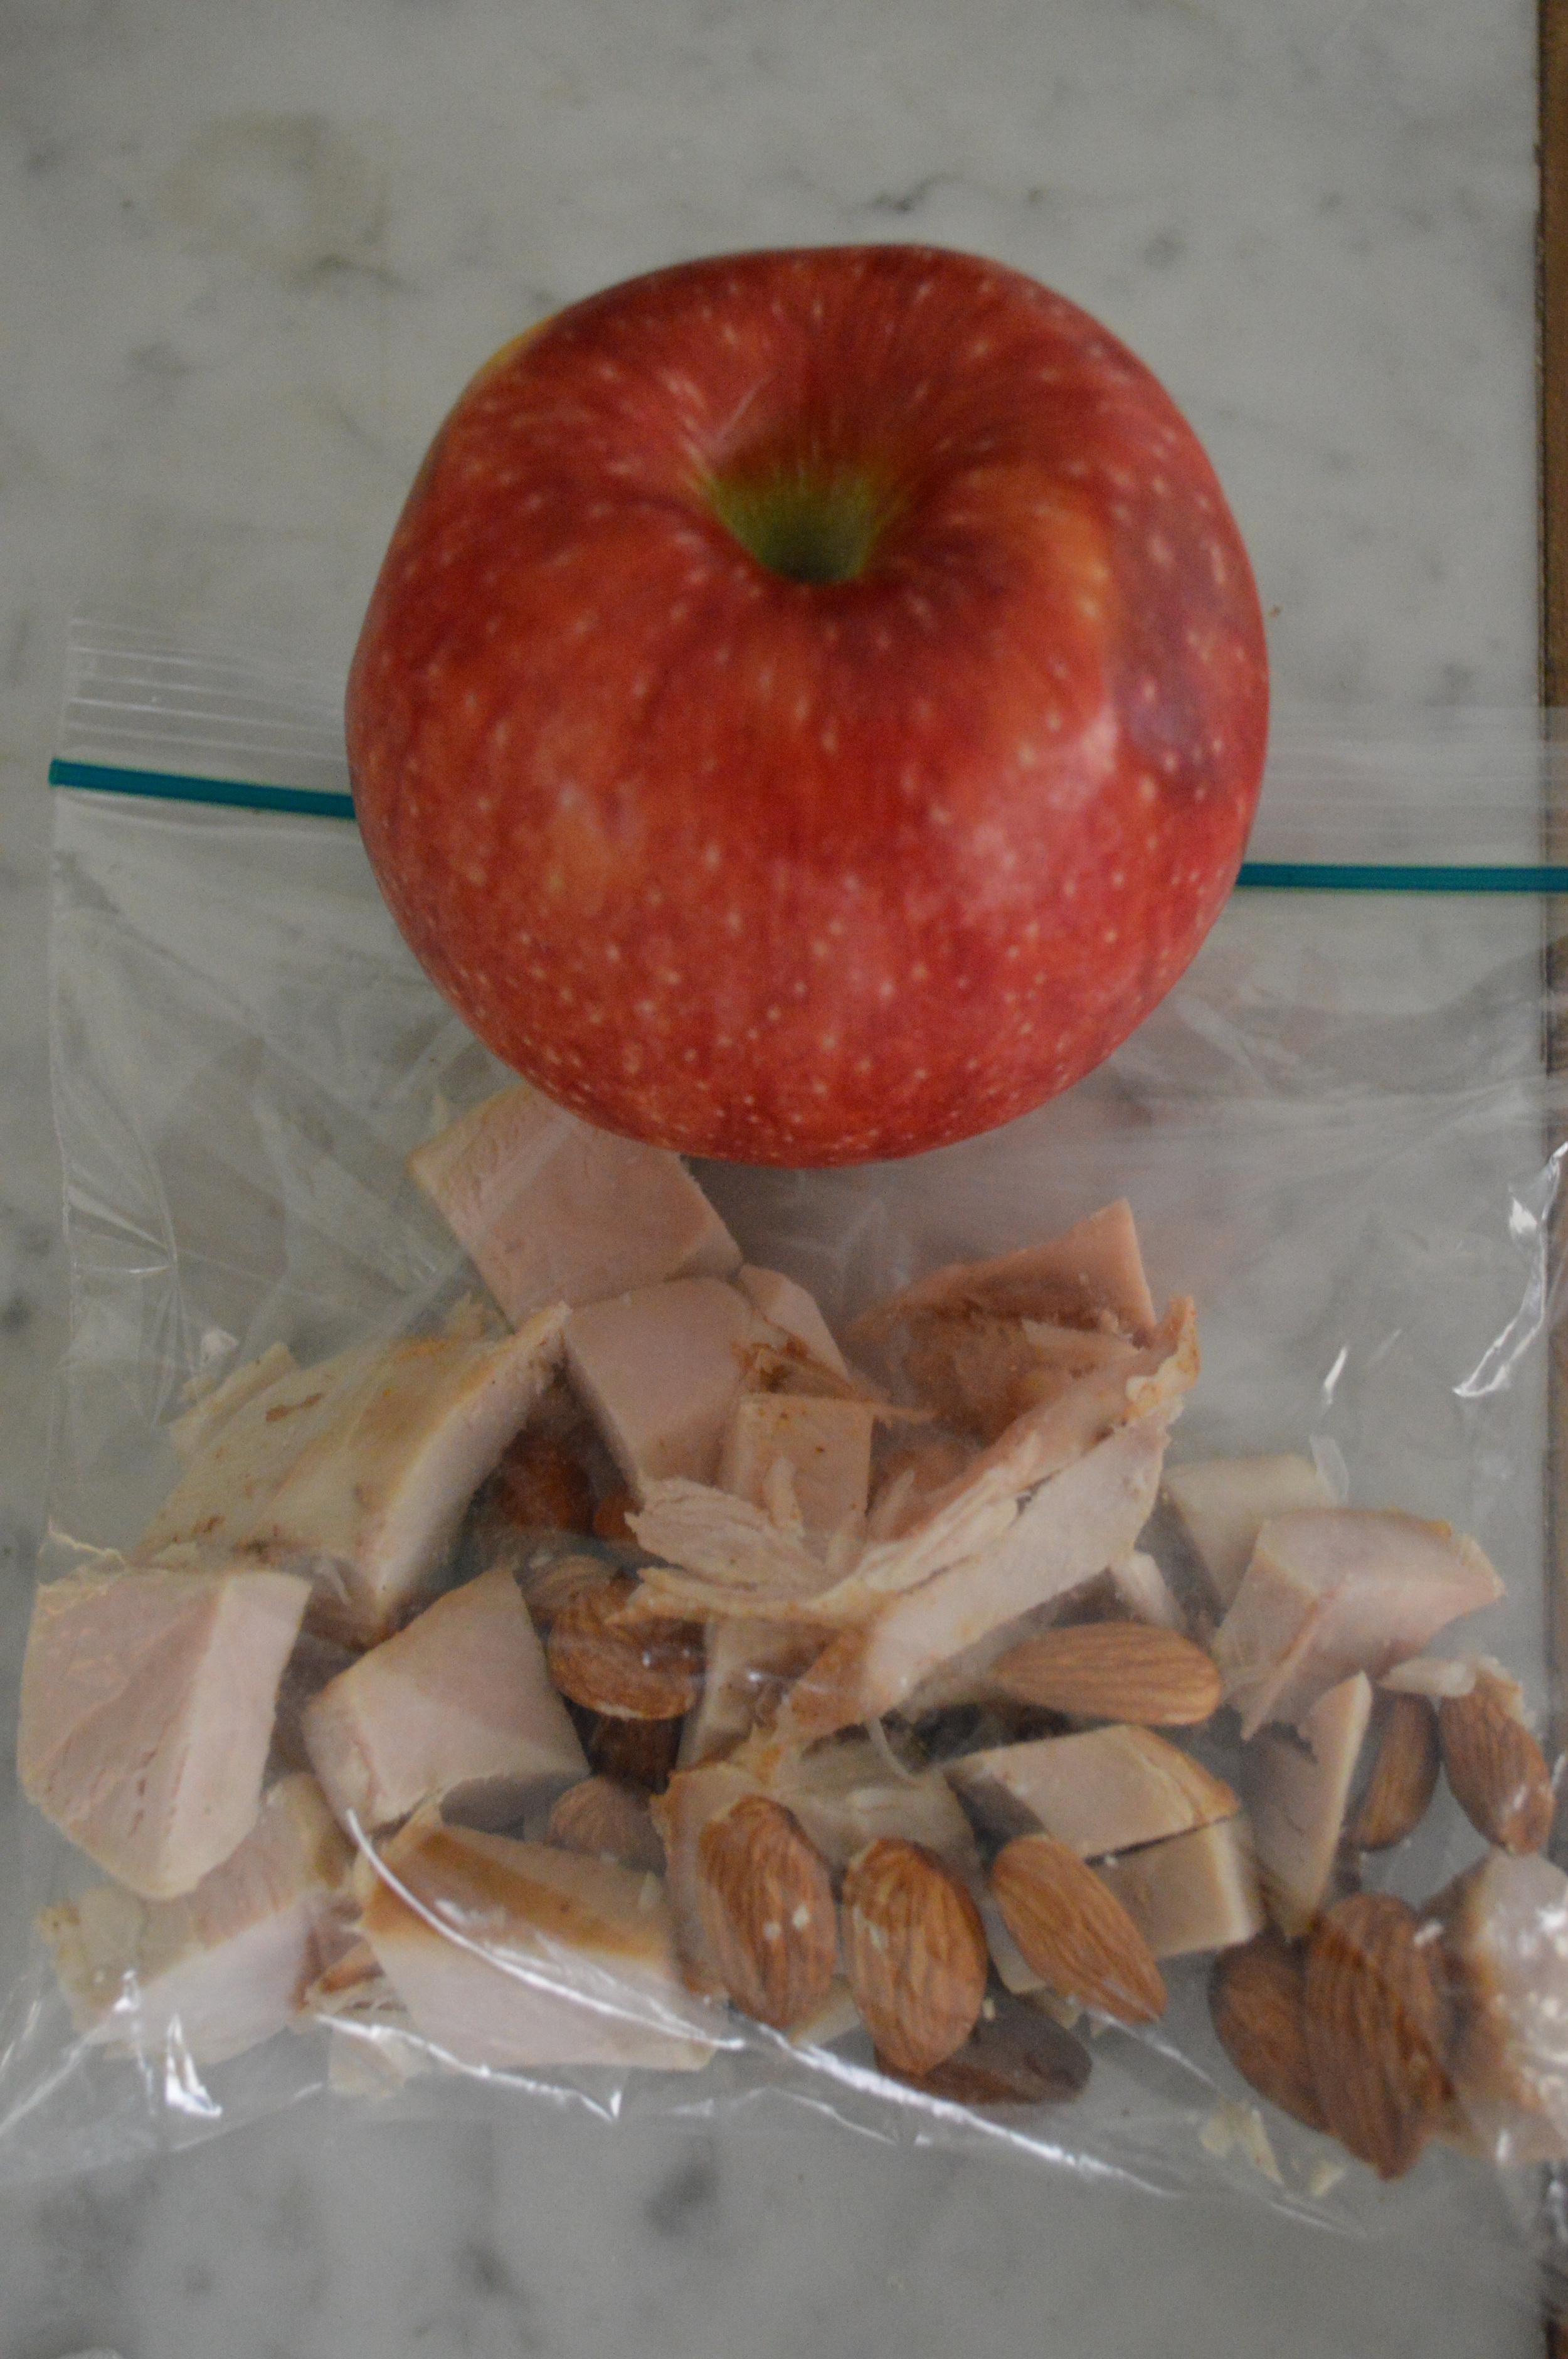 Turkey + Apple Snack